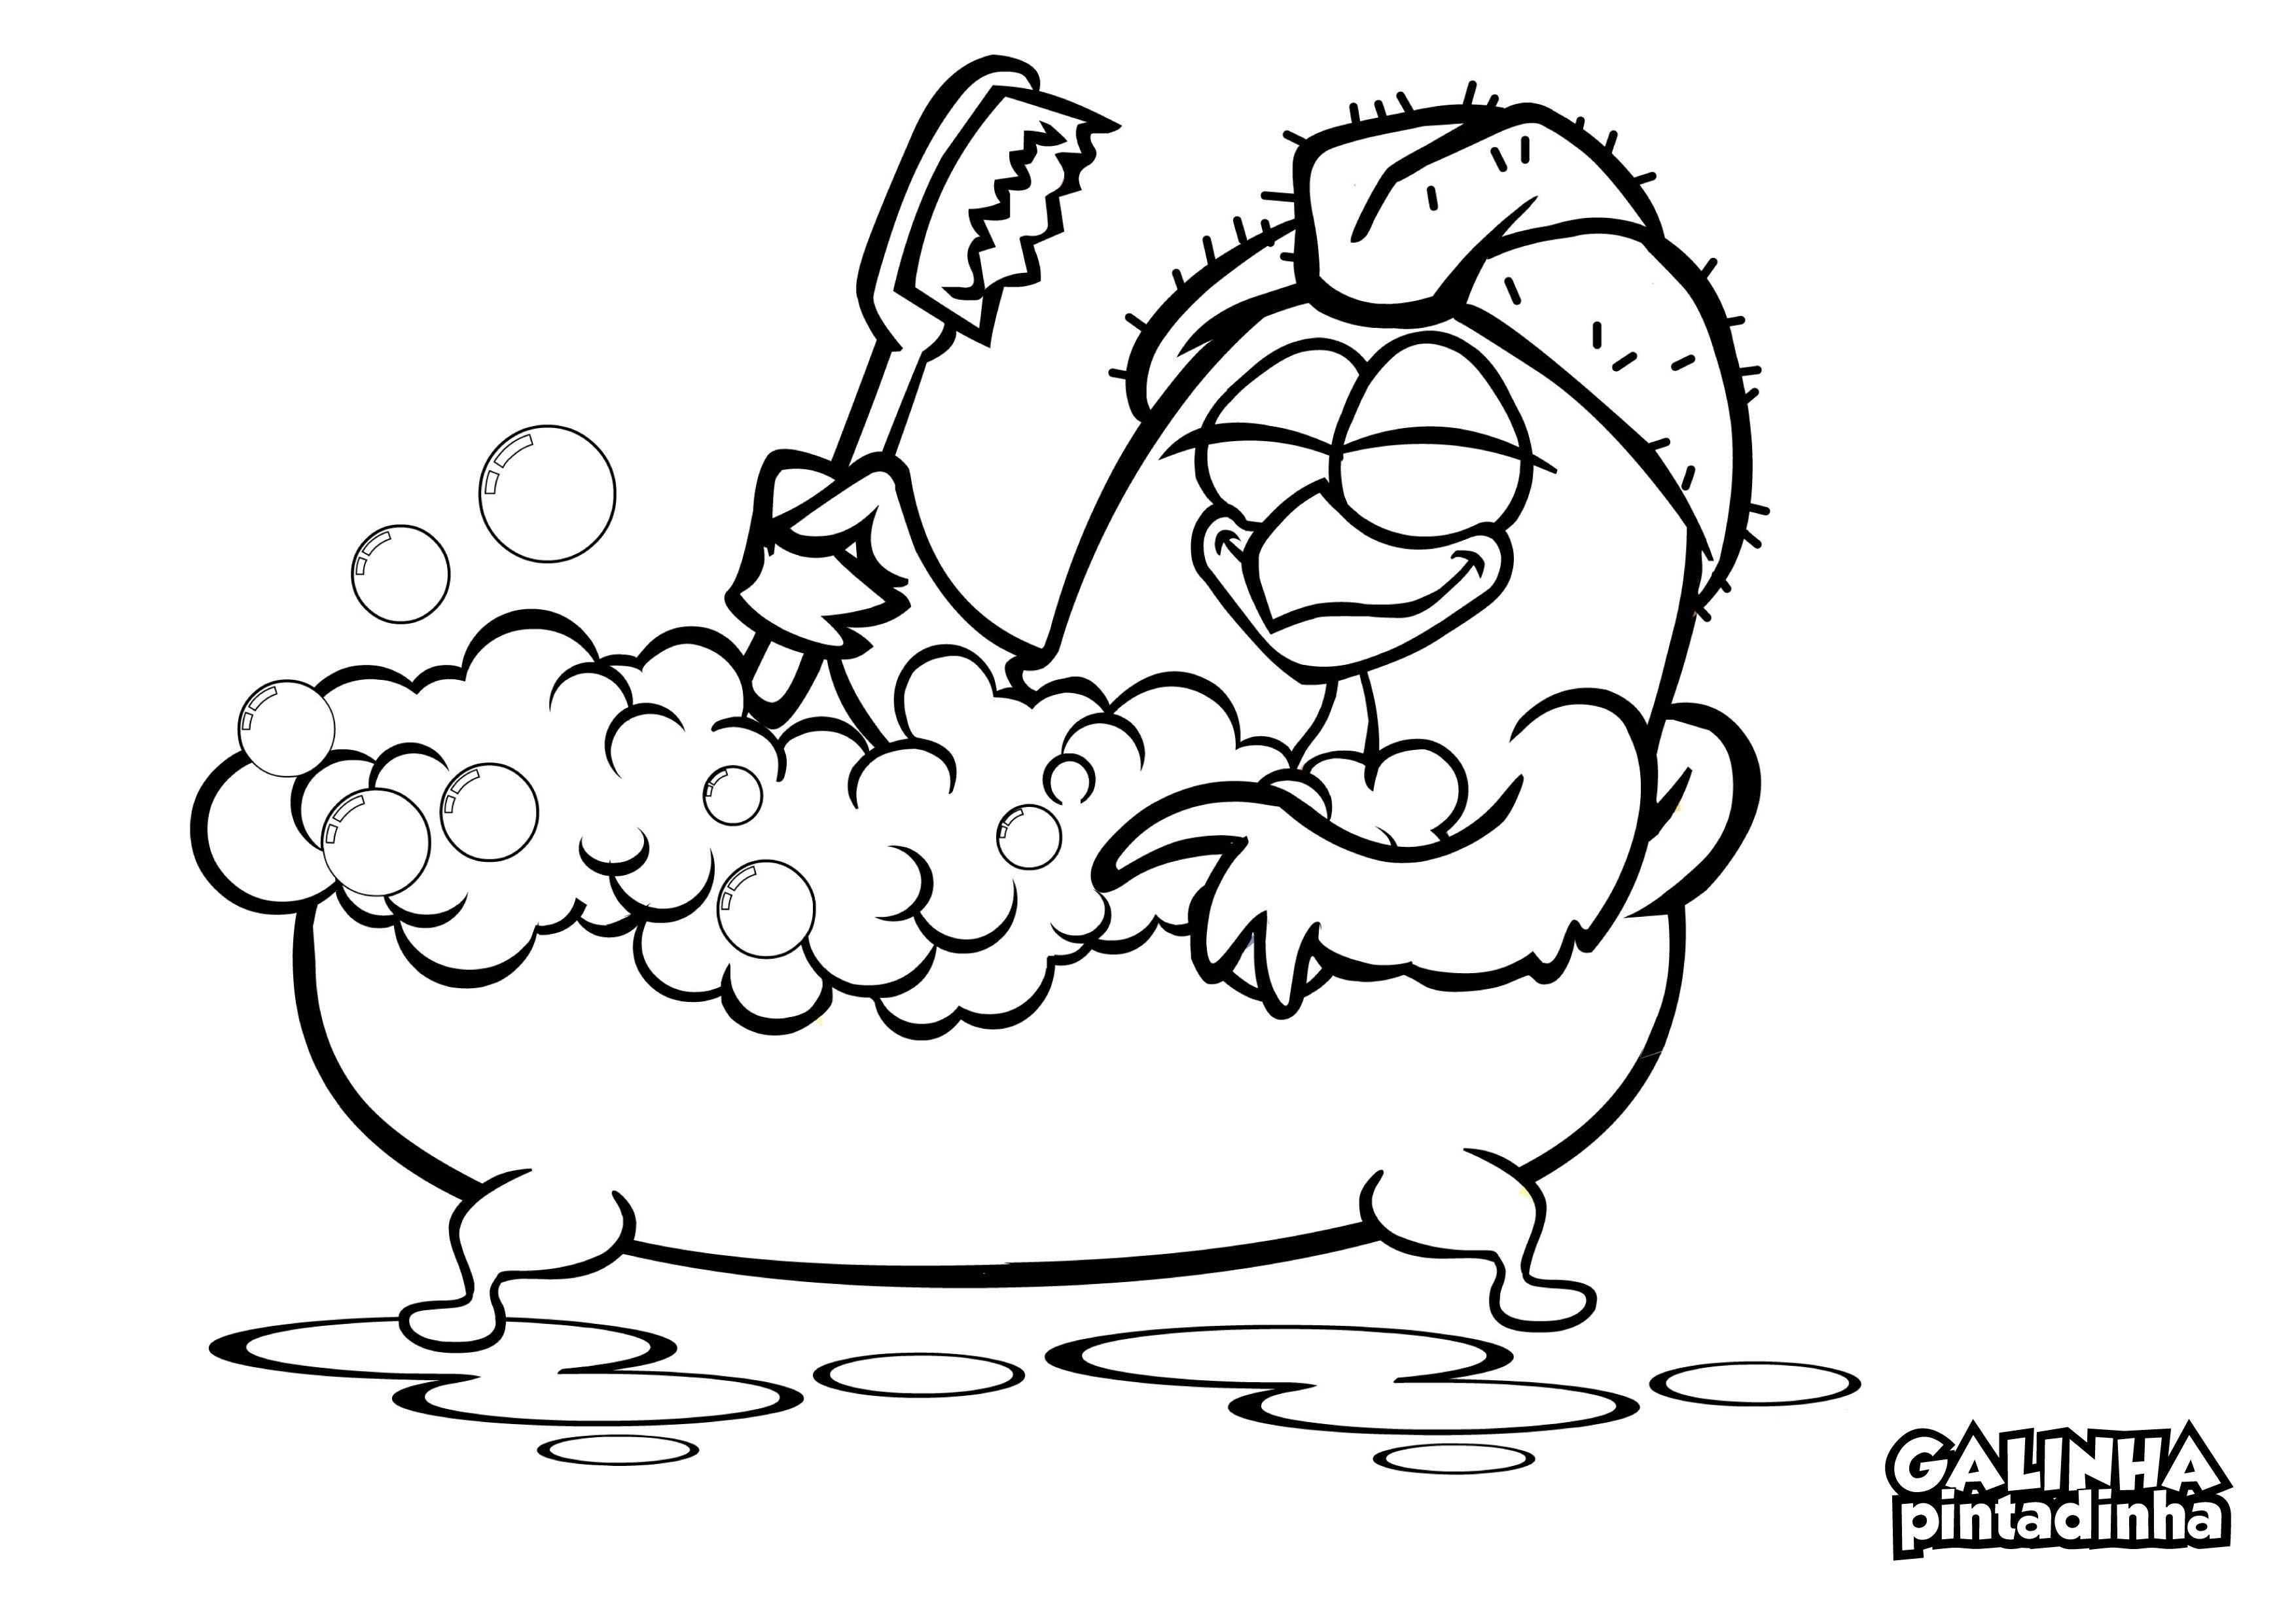 Gallos Coloridos Dibujos Animados: Dibujos De Gallinas Para Colorear E Imprimir